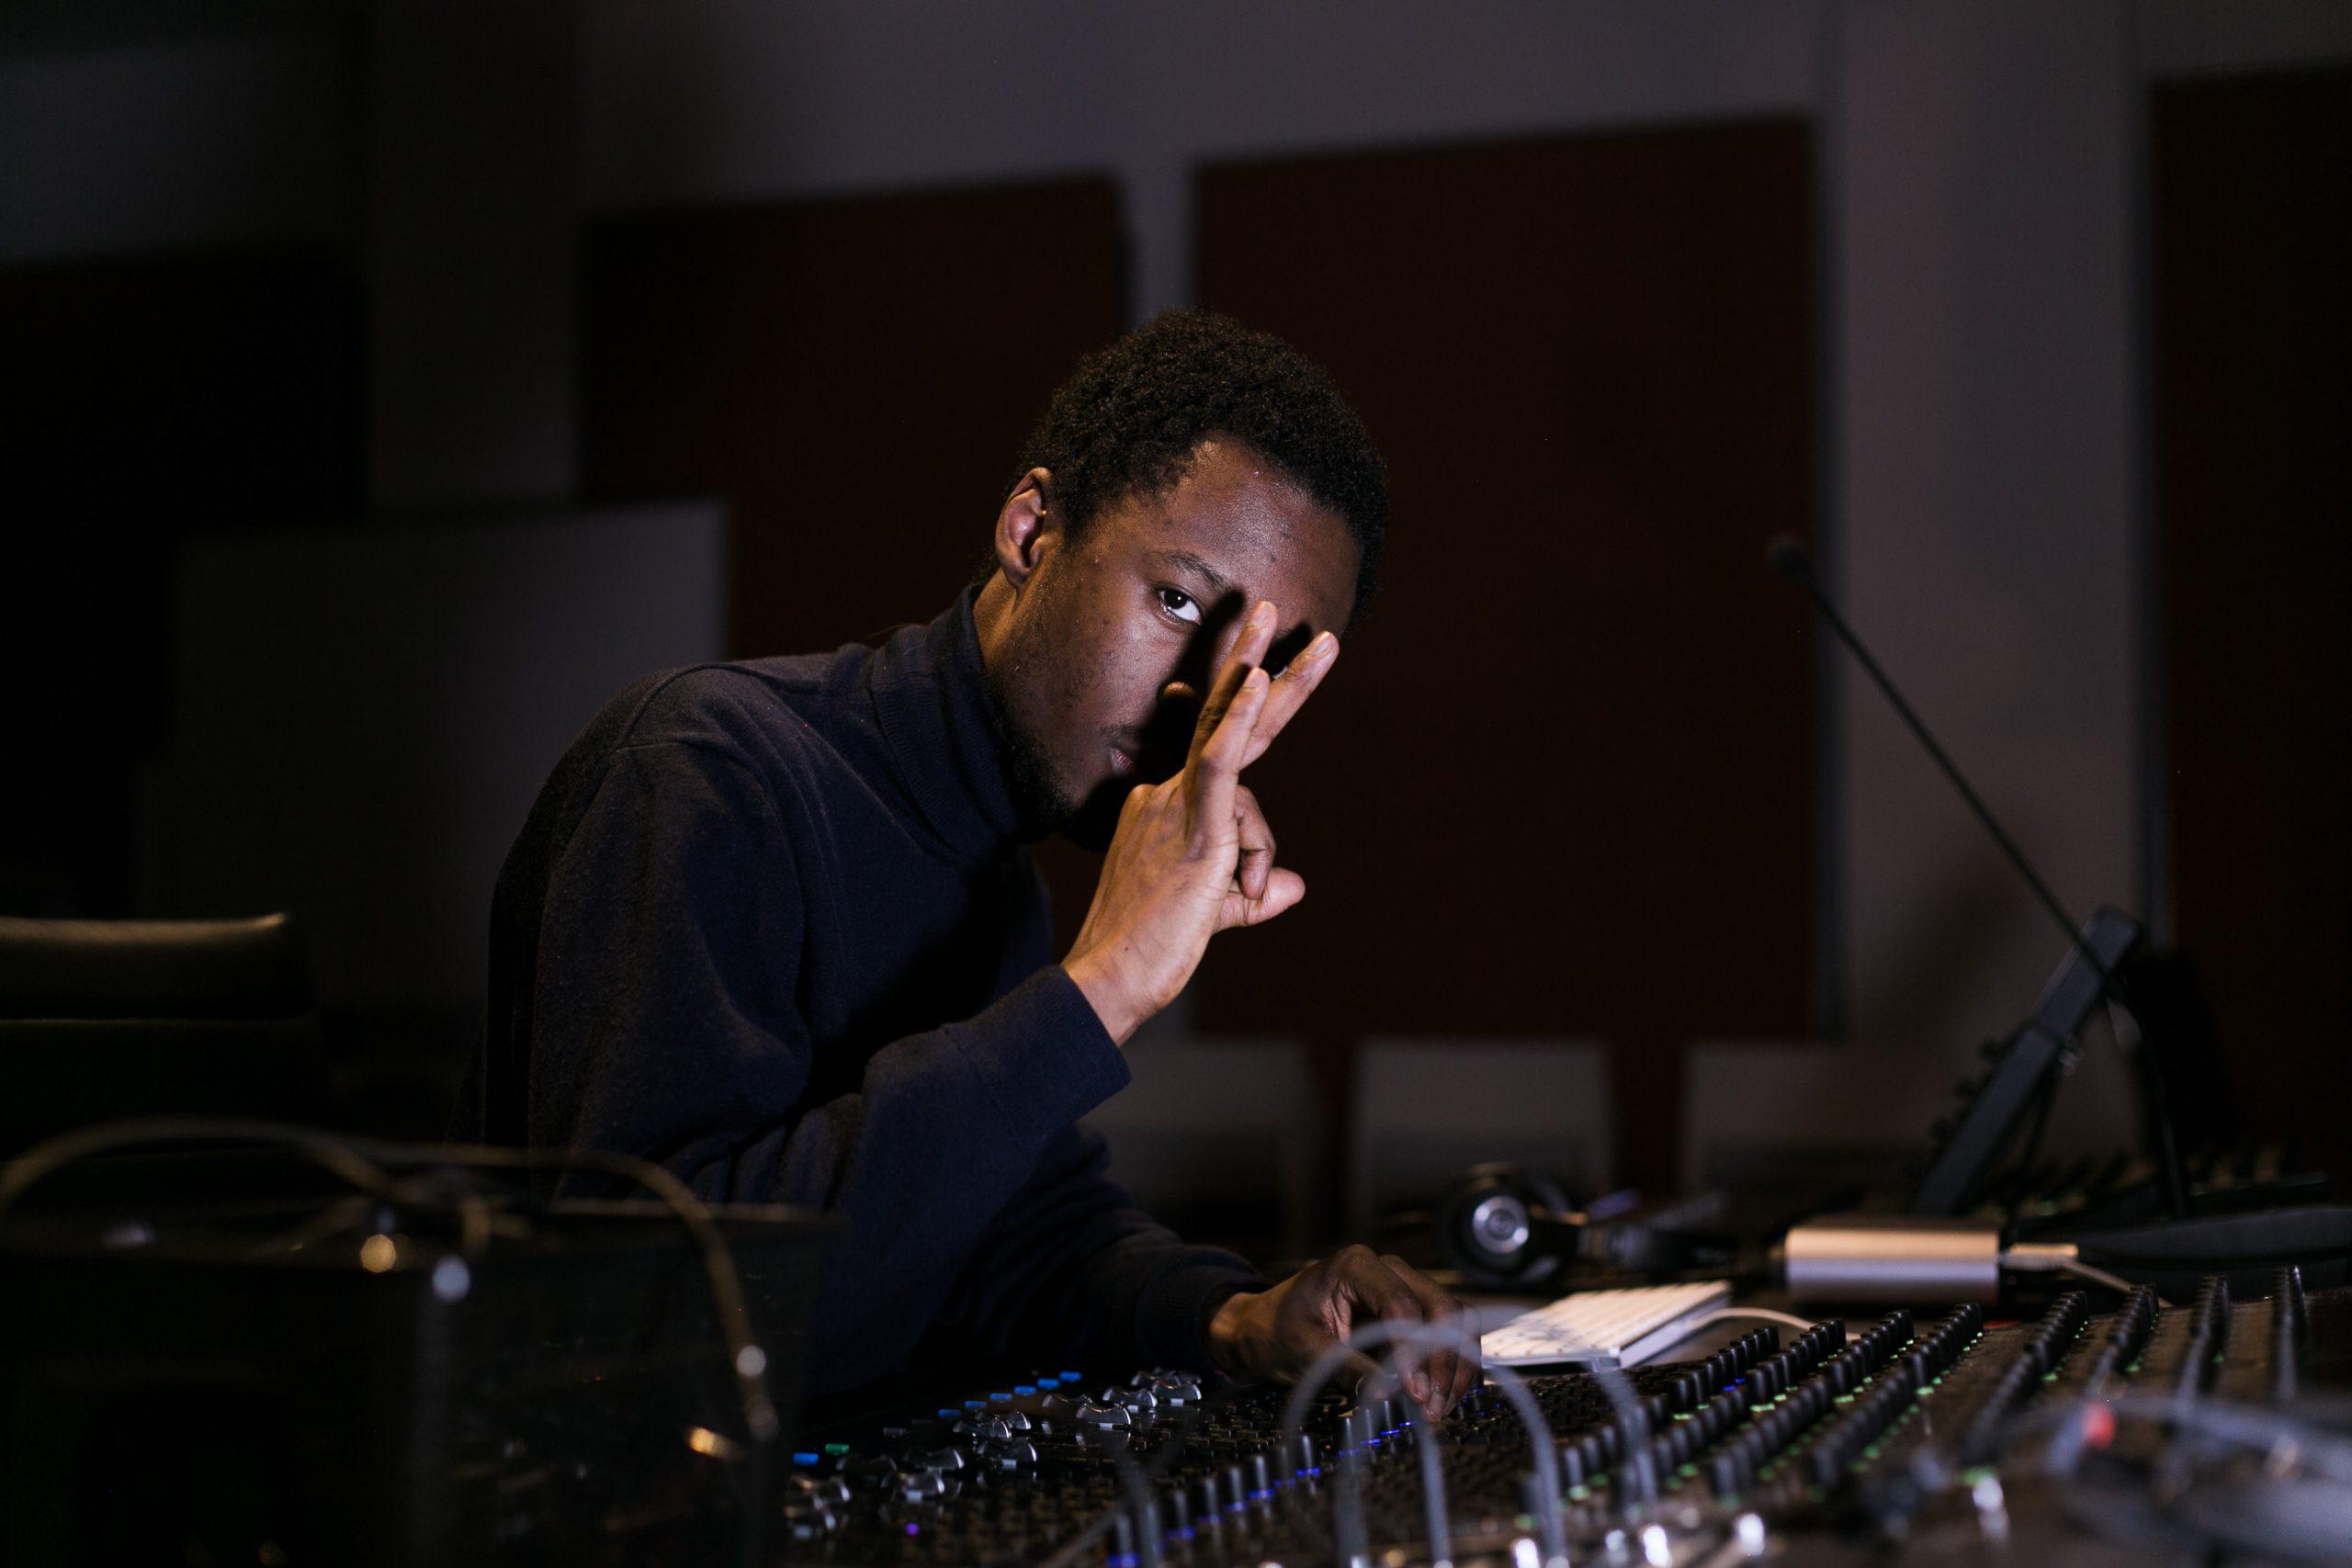 Producer ODNP, Studio